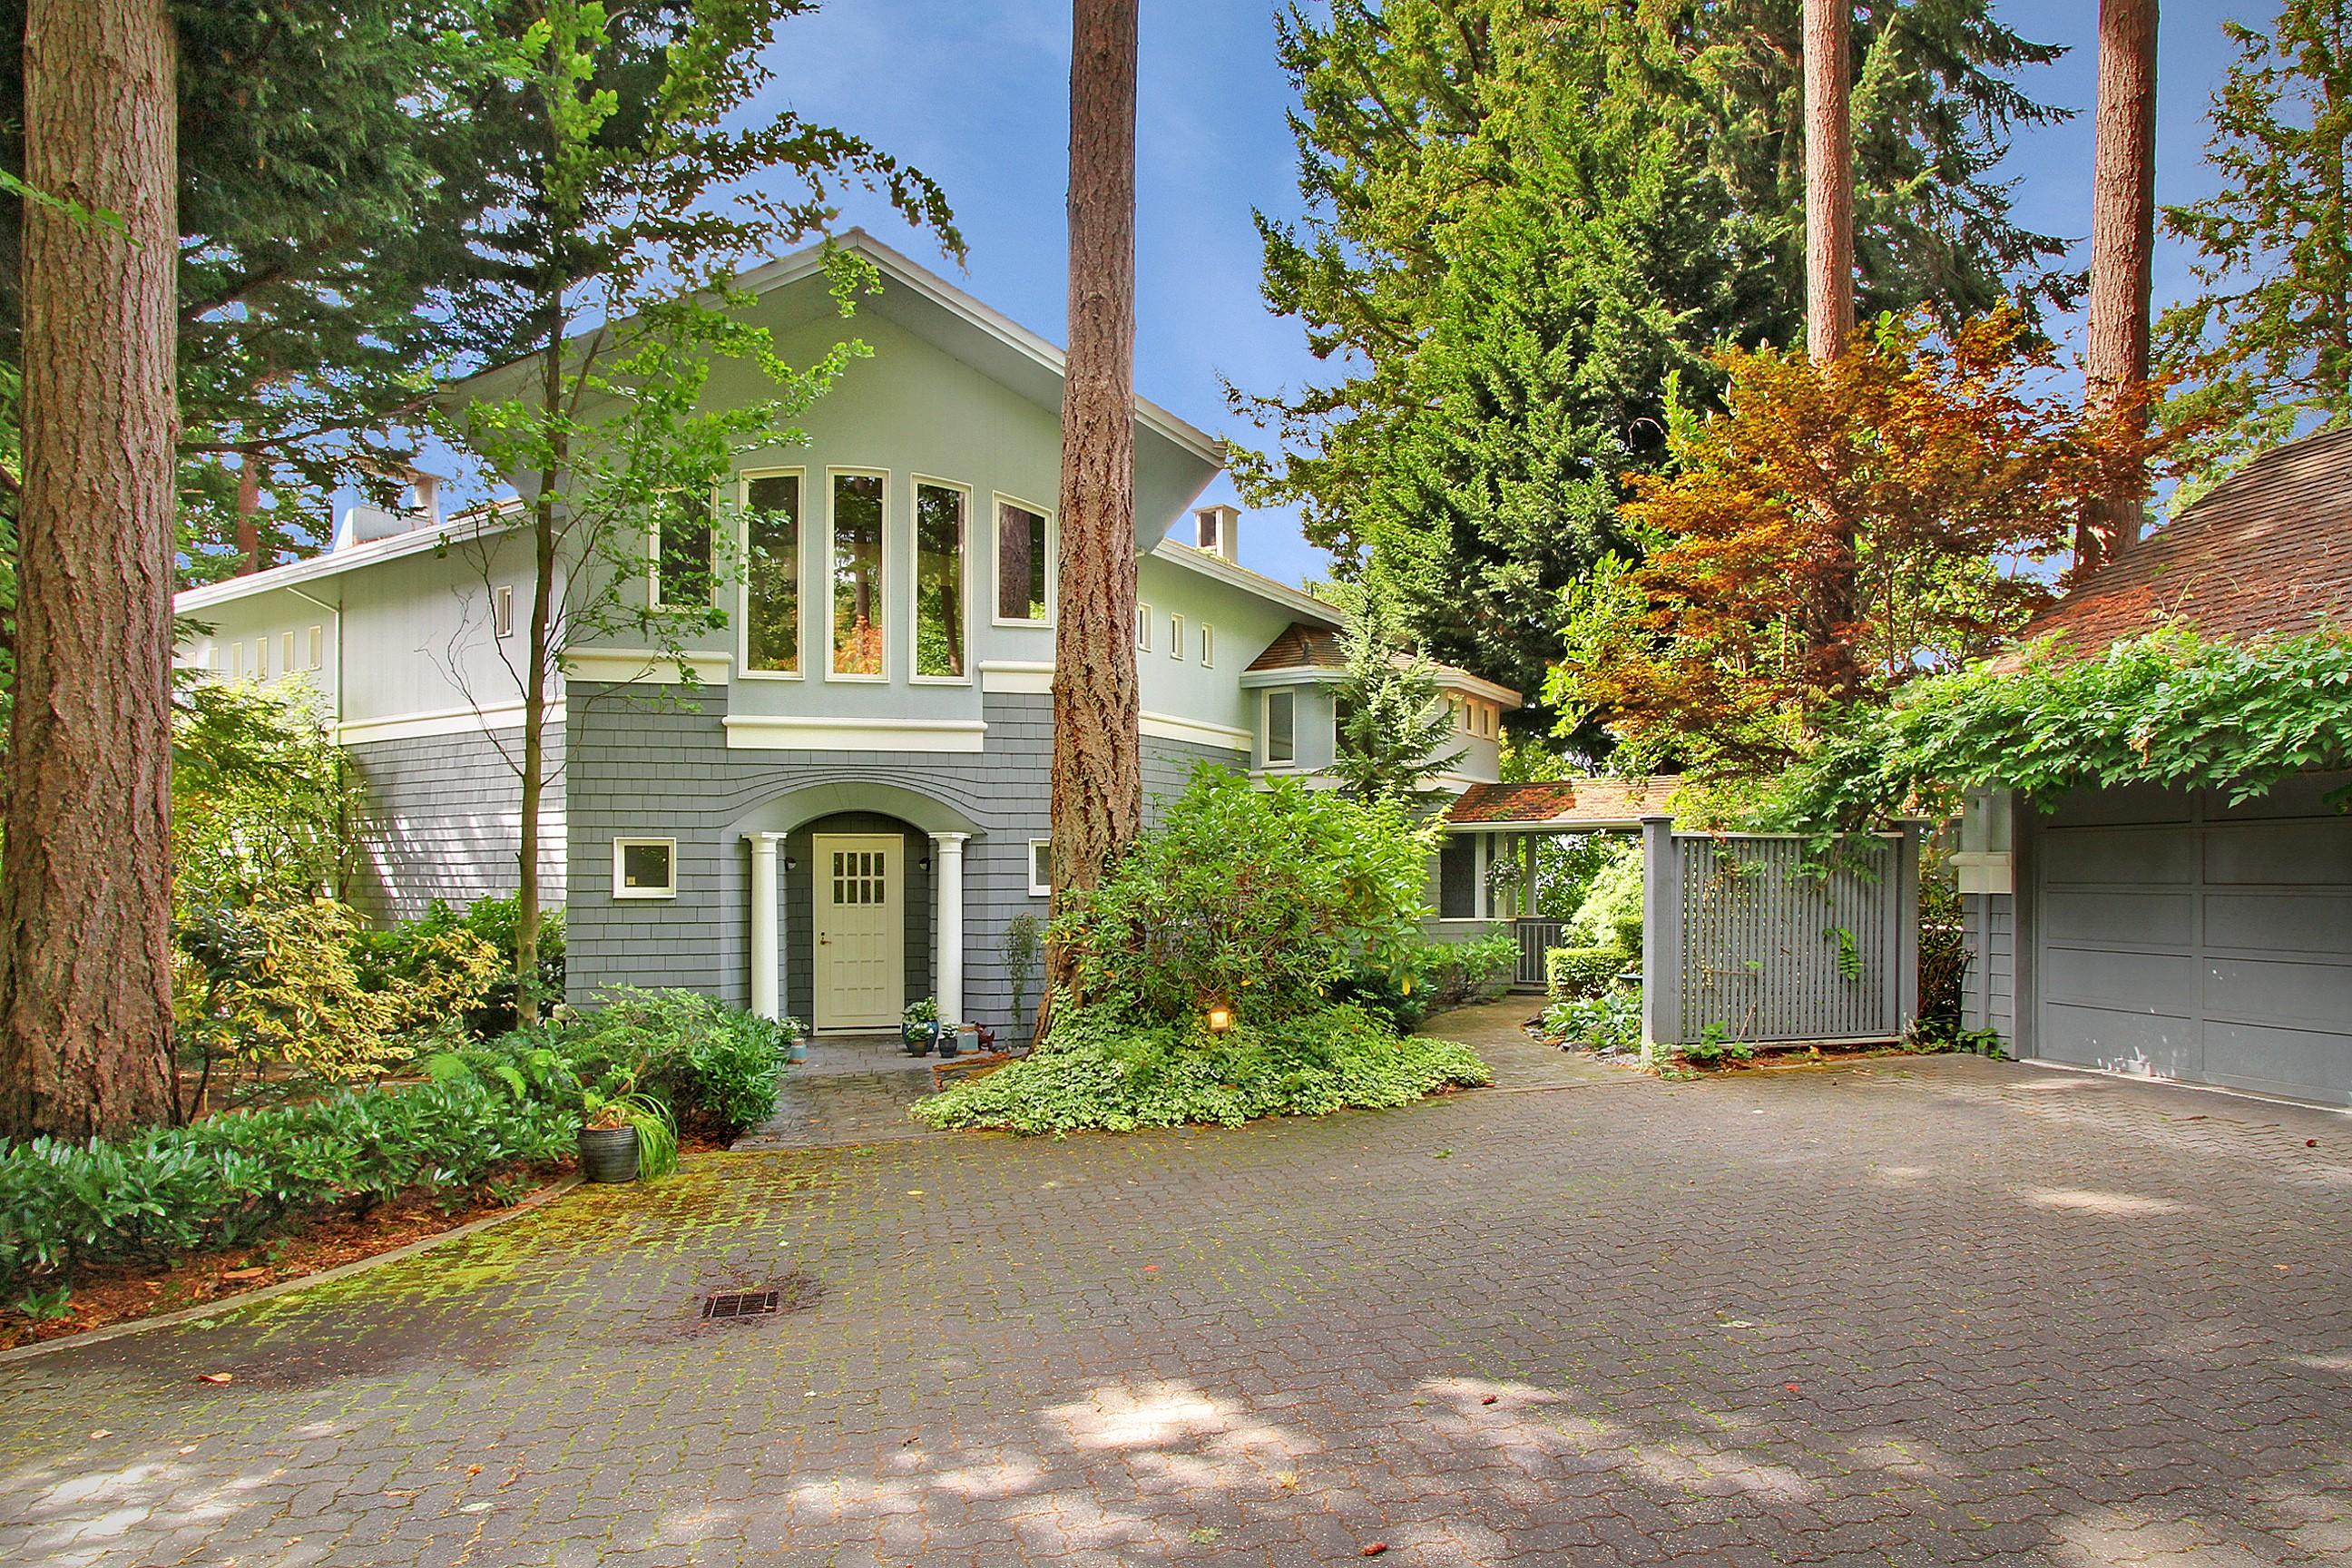 獨棟家庭住宅 為 出售 在 Allen Point Living 9606 Beachwood Dr NW Gig Harbor, 華盛頓州 98332 美國